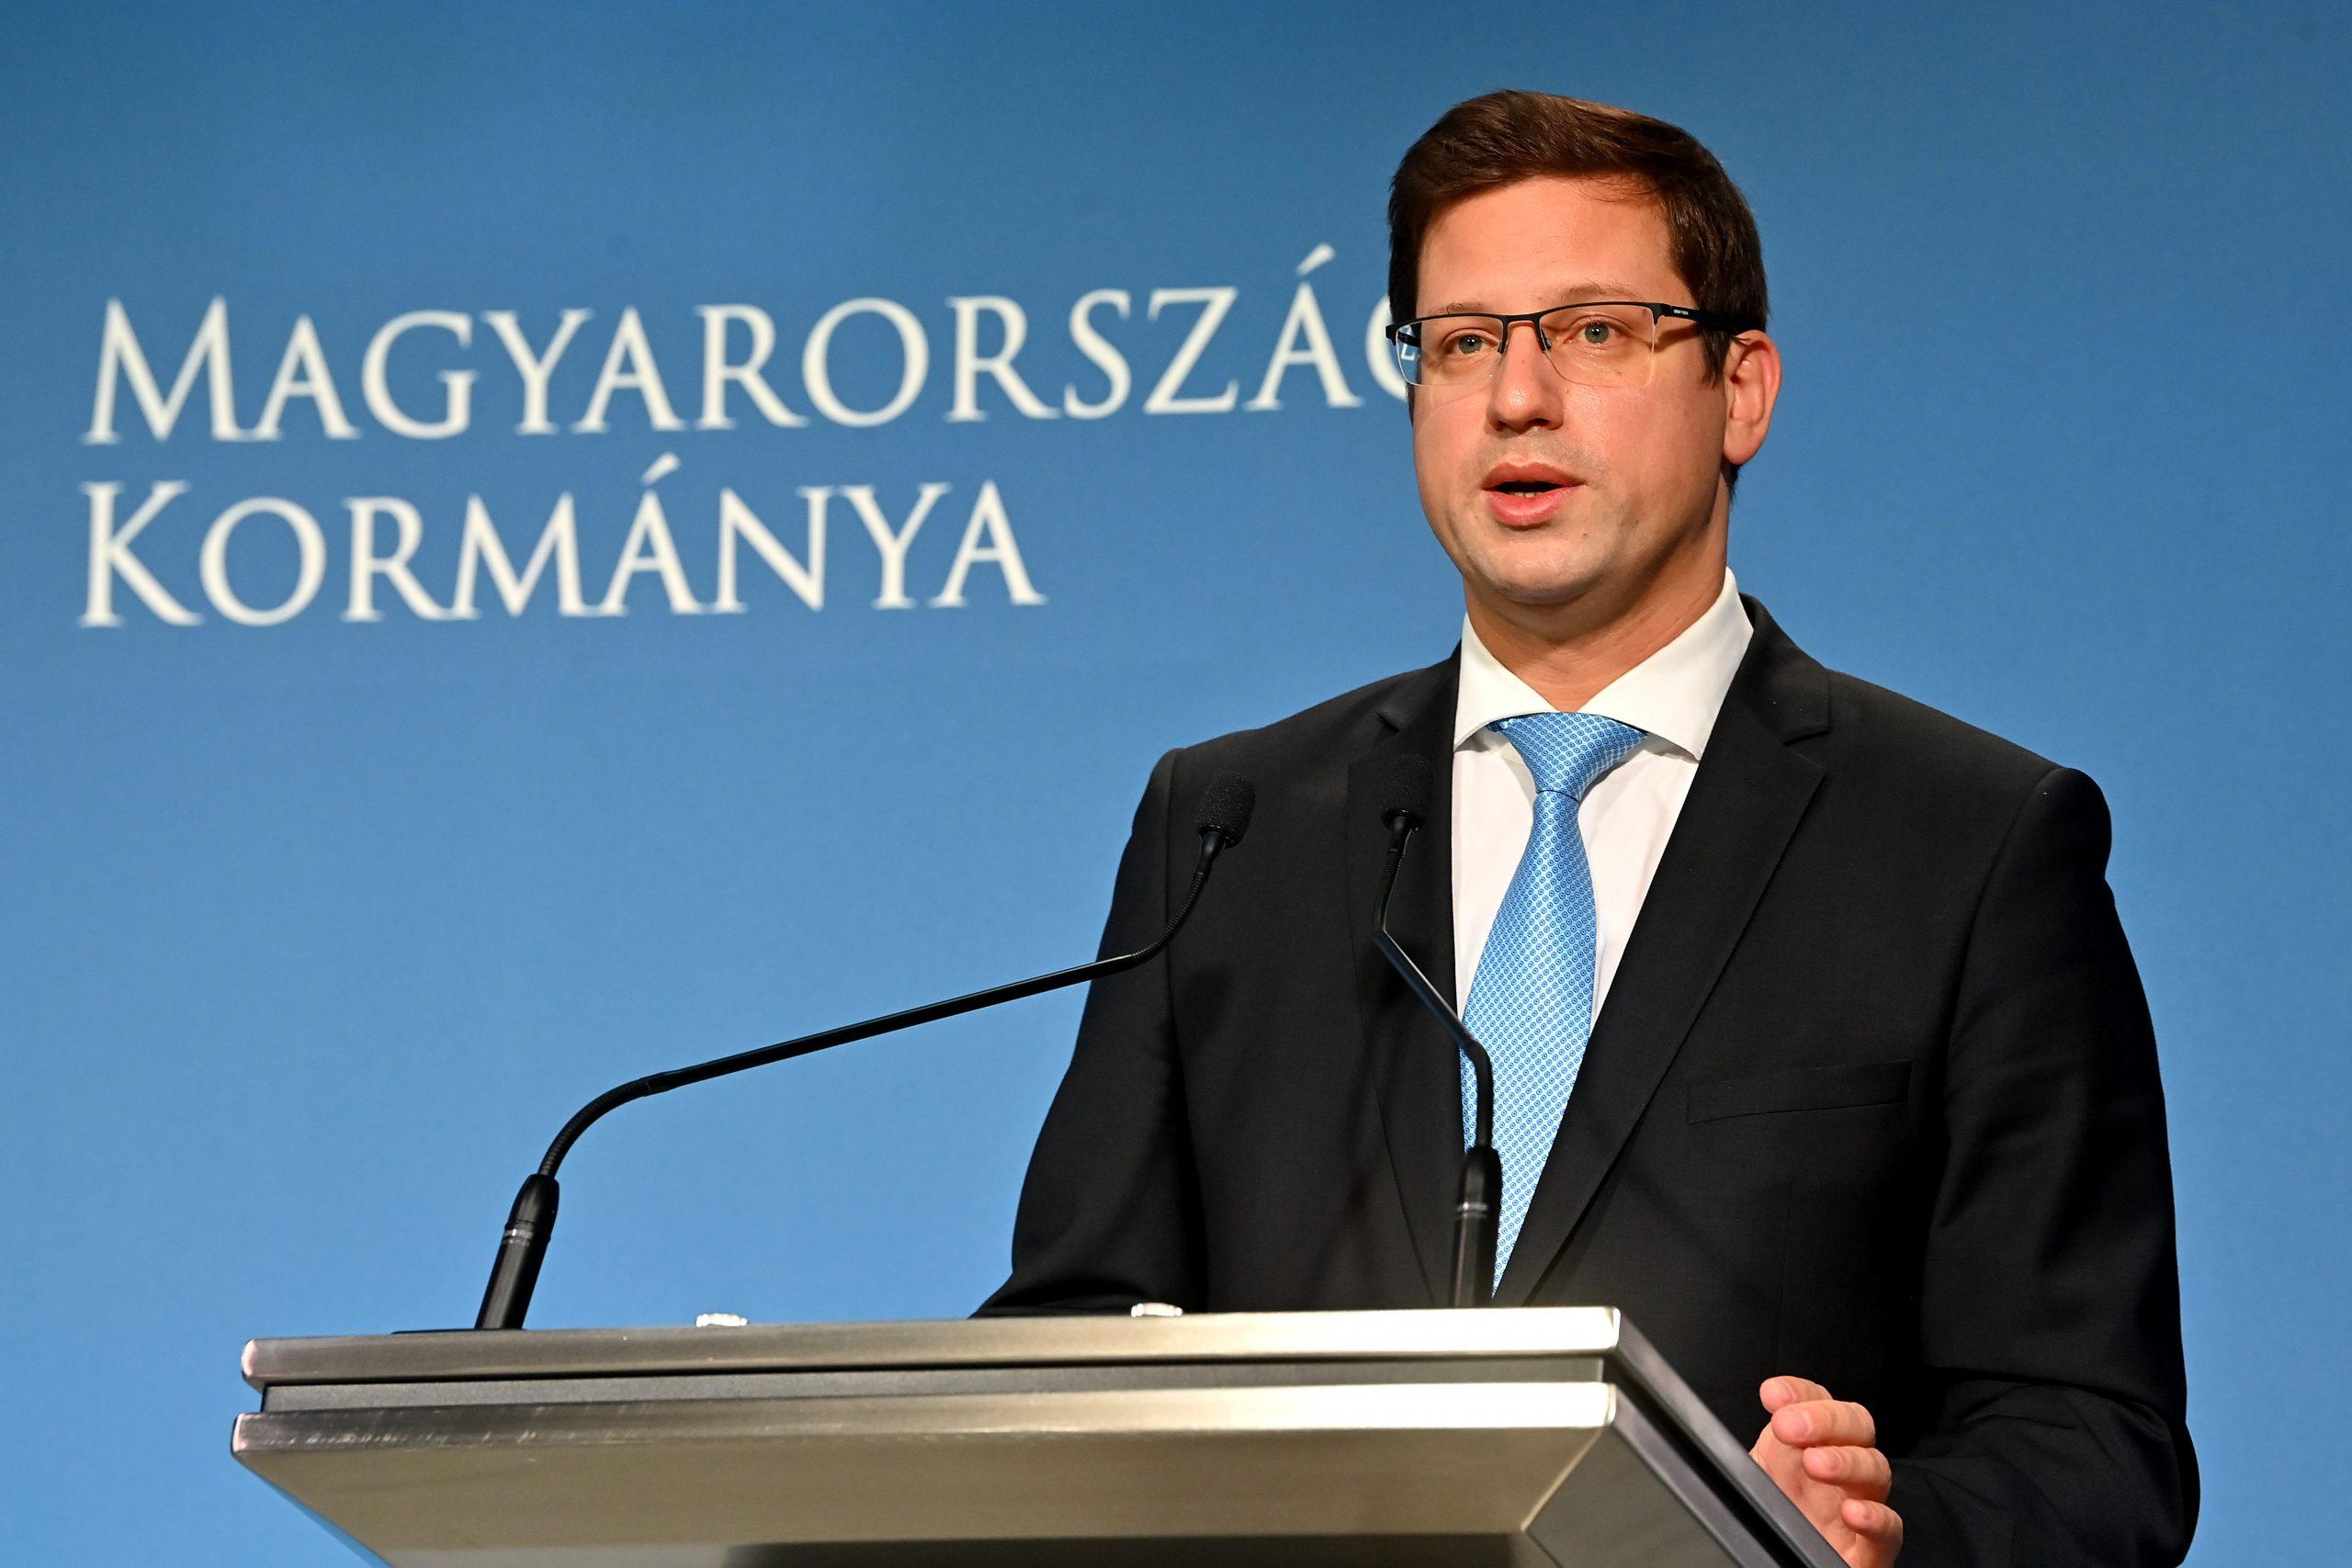 Kanzleramtsminister: